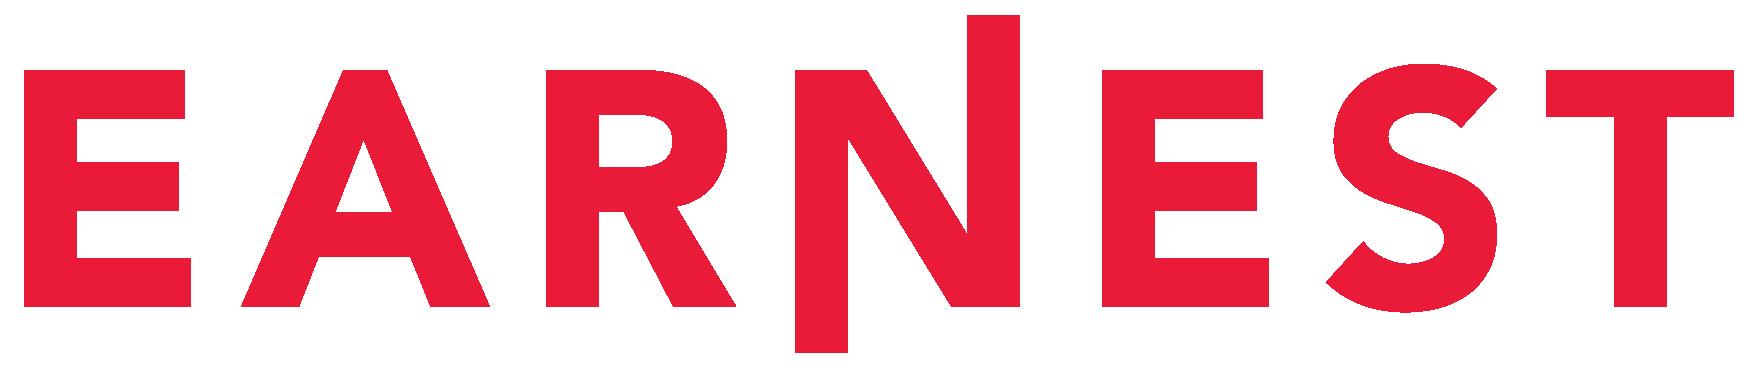 earnest-logo-for-web-poppy-01.png